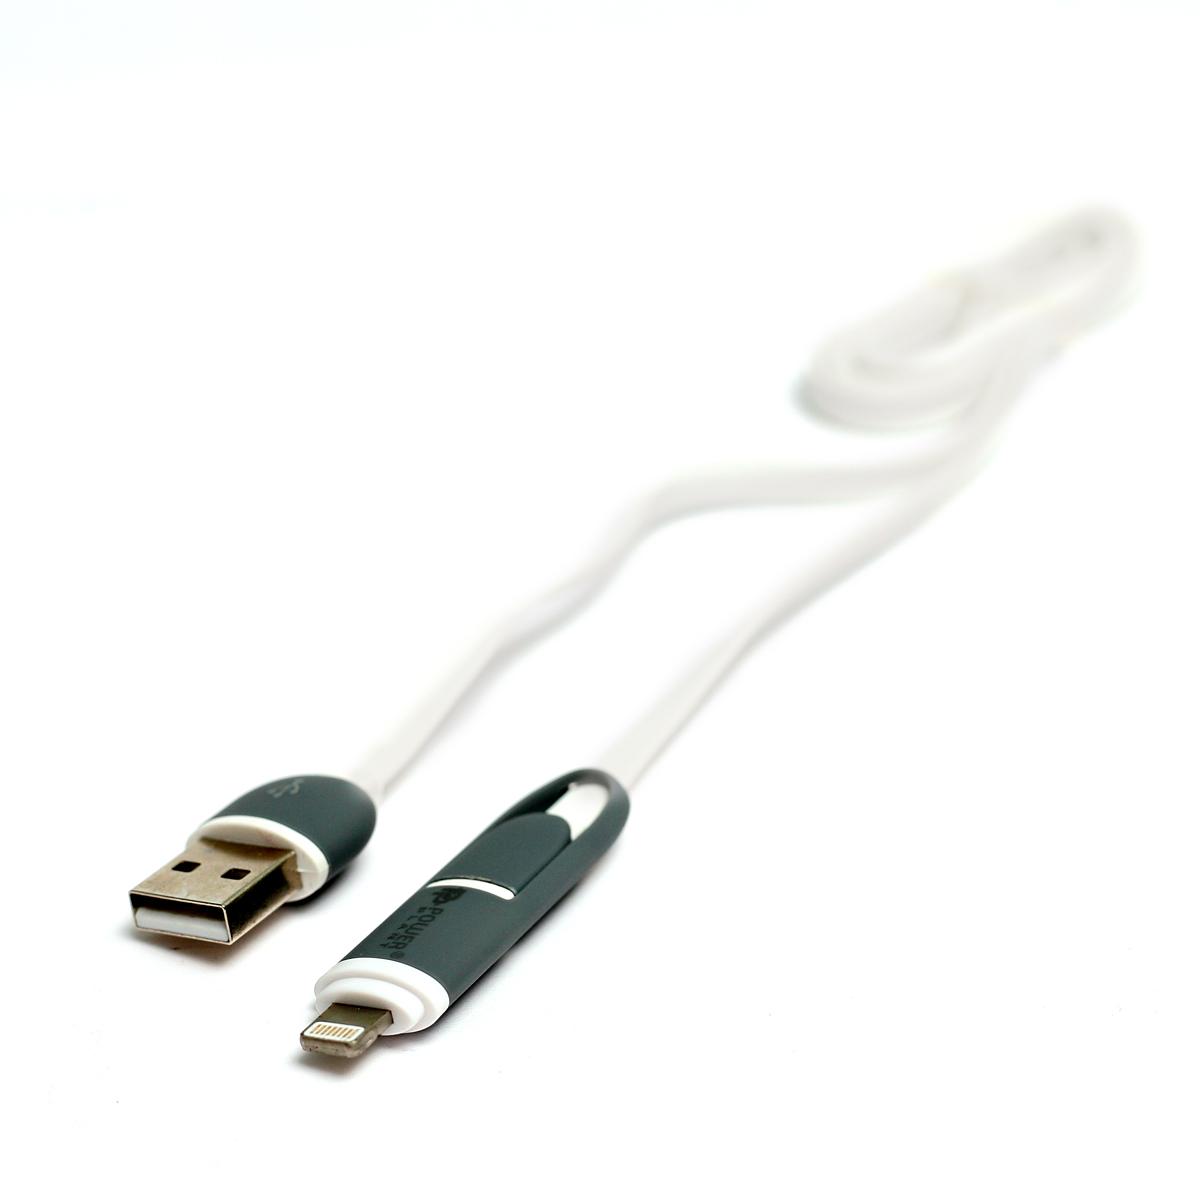 Купить Кабель PowerPlant Quick Charge 2A 2-в-1 flat USB 2.0 AM – Lightning/Micro 1мВwhite